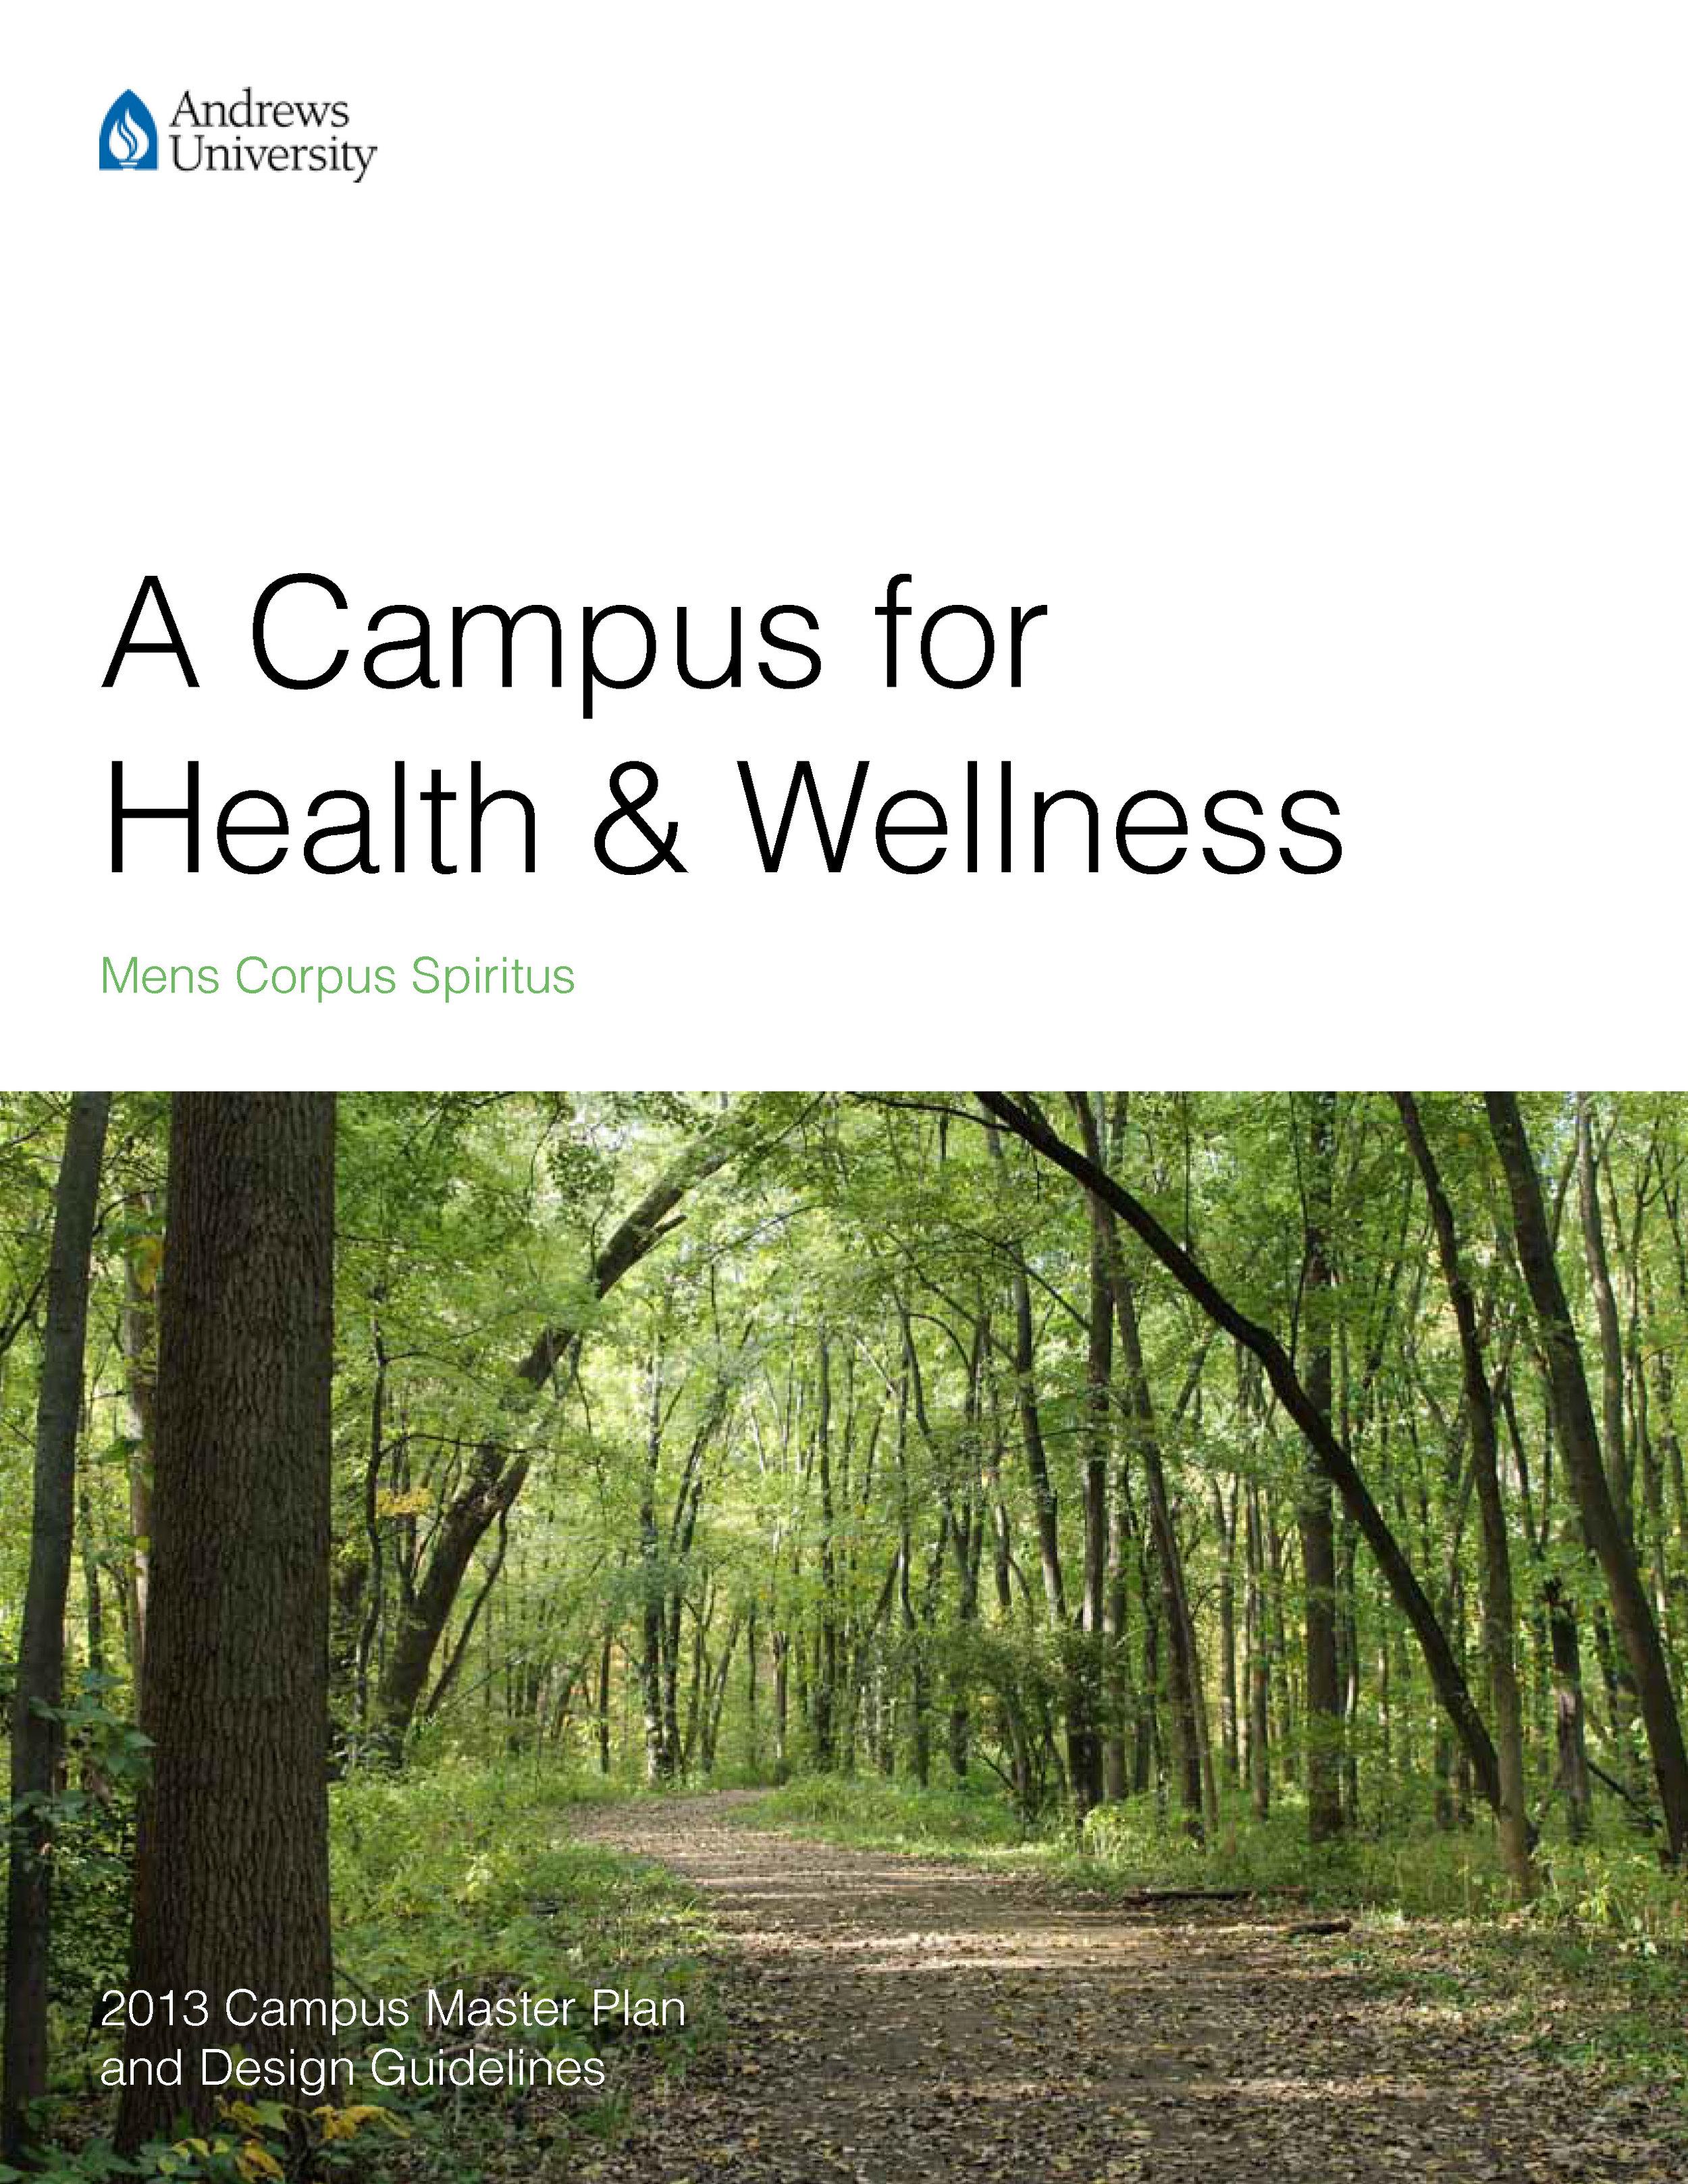 Andrews University, Michigan